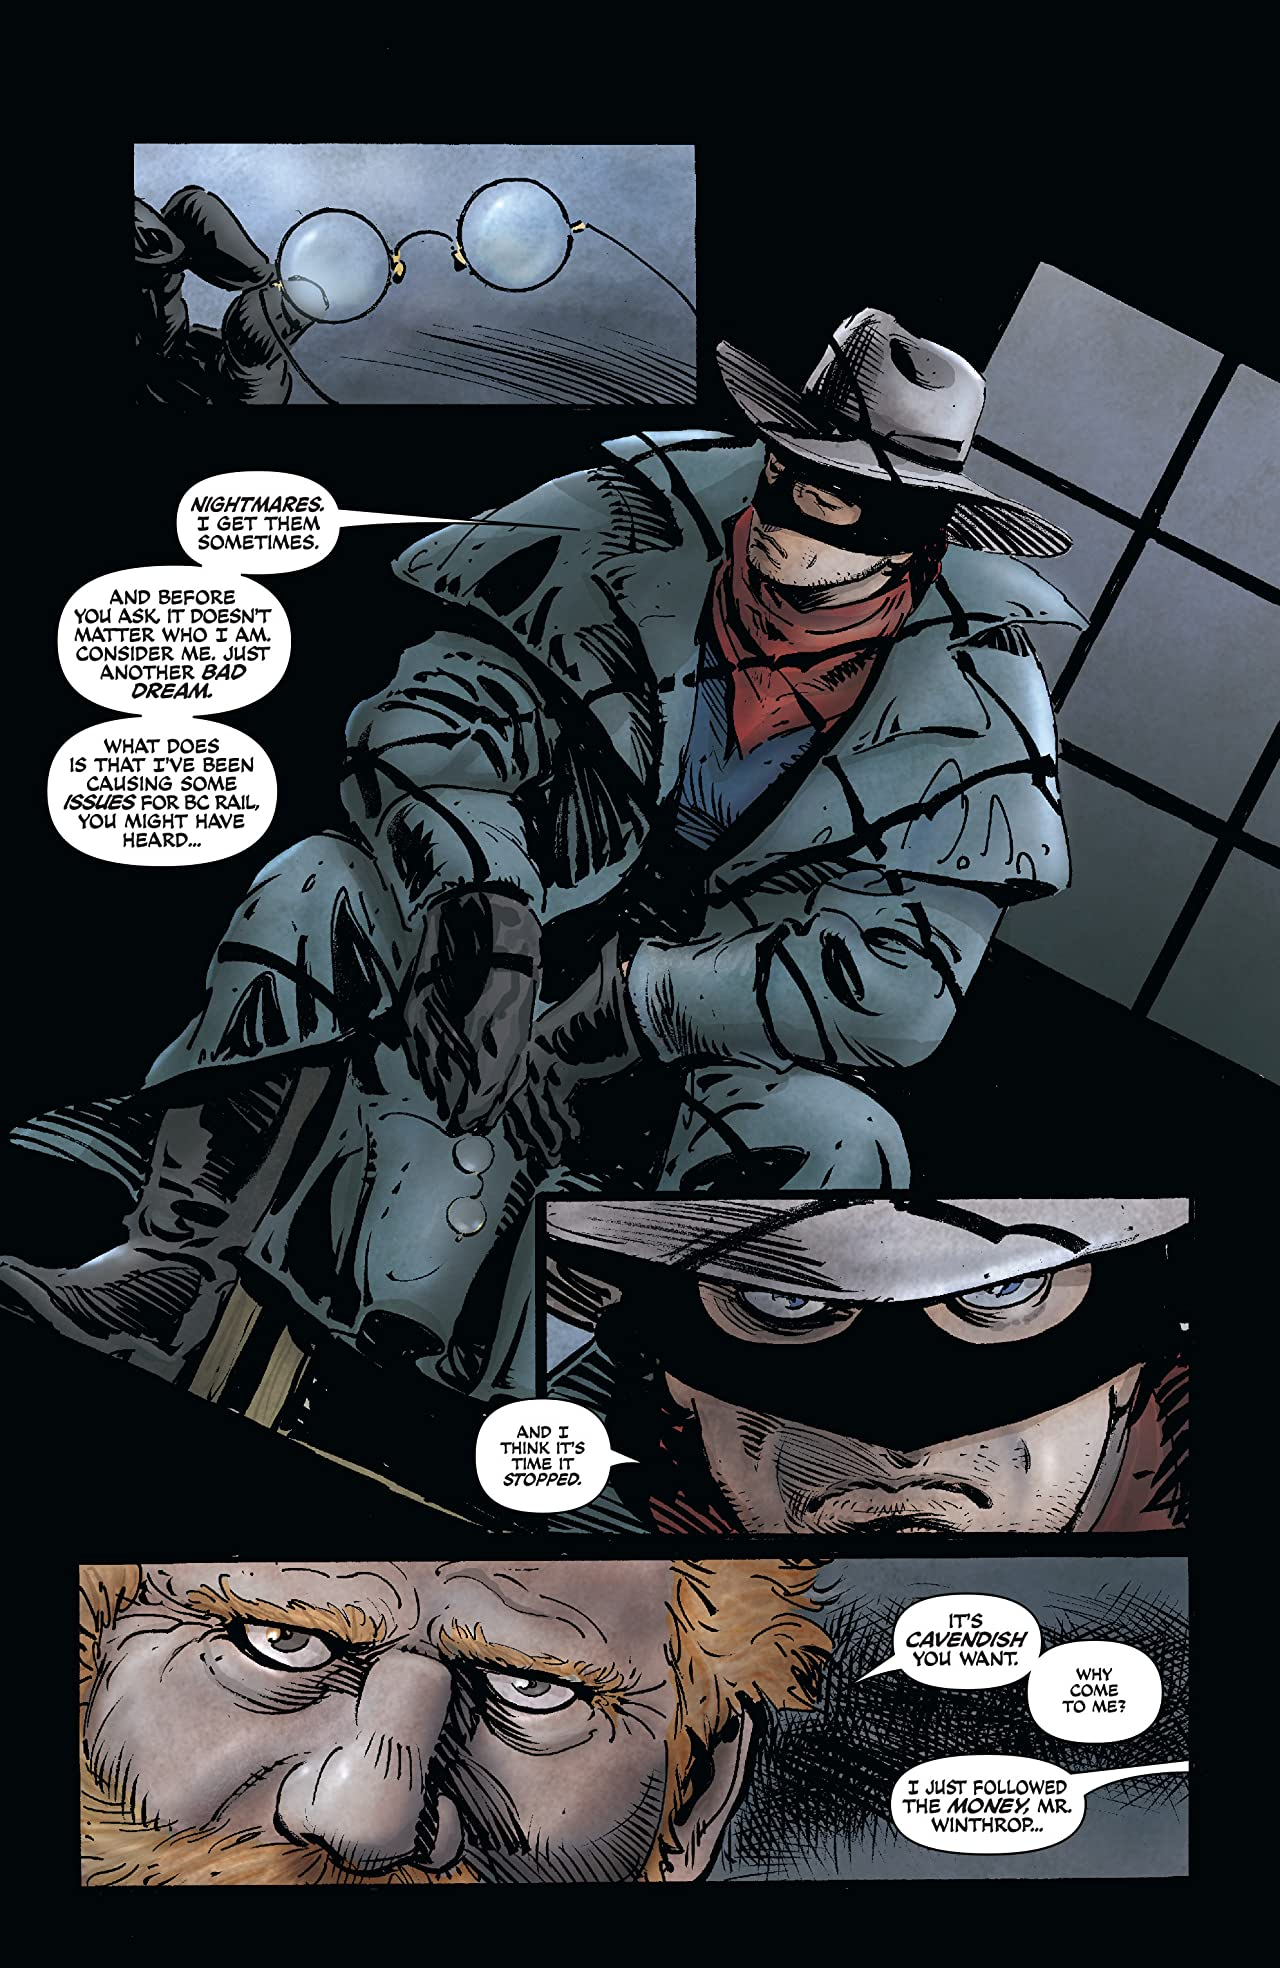 The Lone Ranger #12